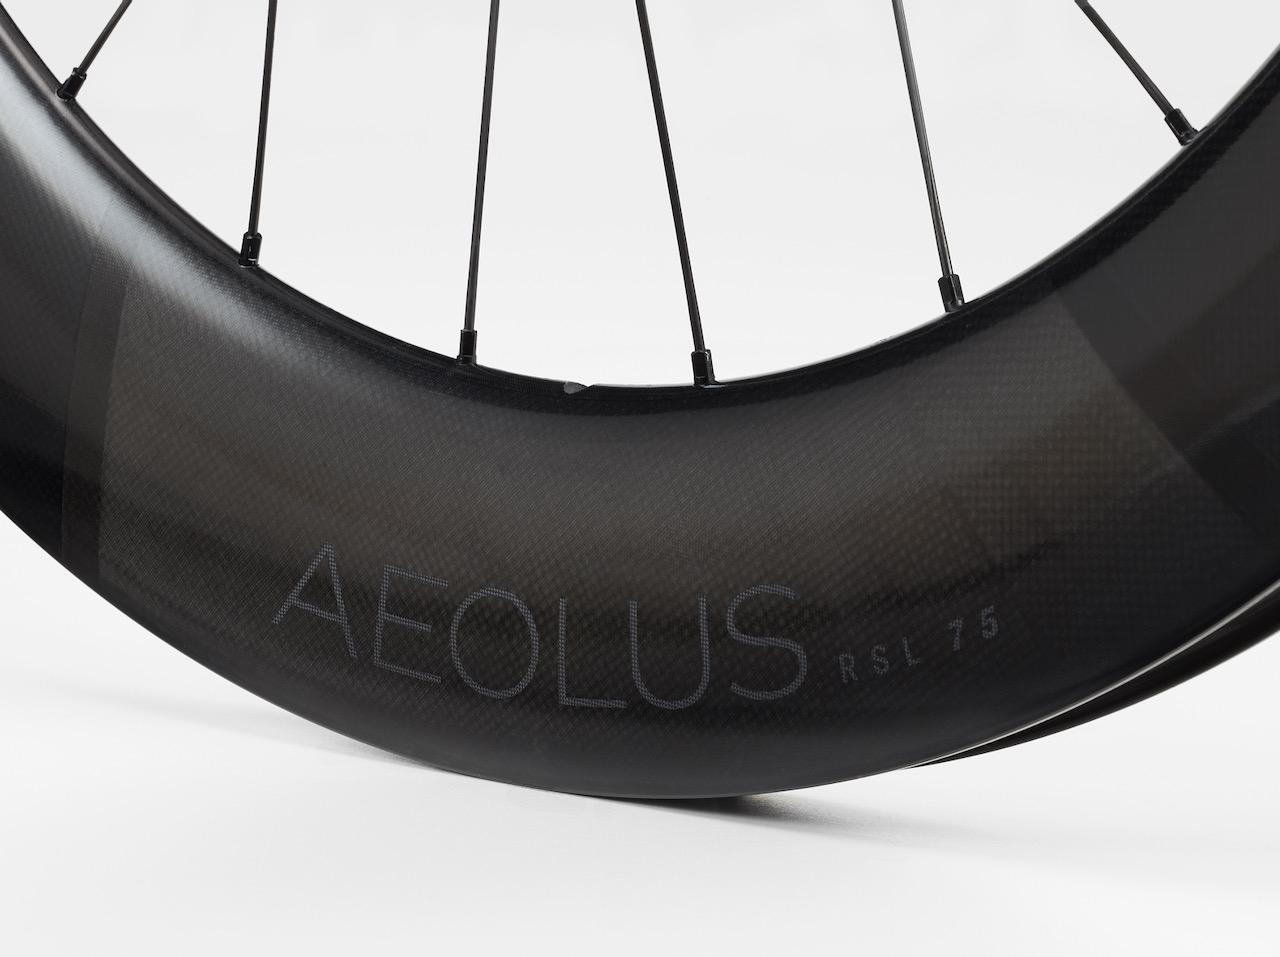 Bontrager Aeolus pro road wheels rsl 75 rim